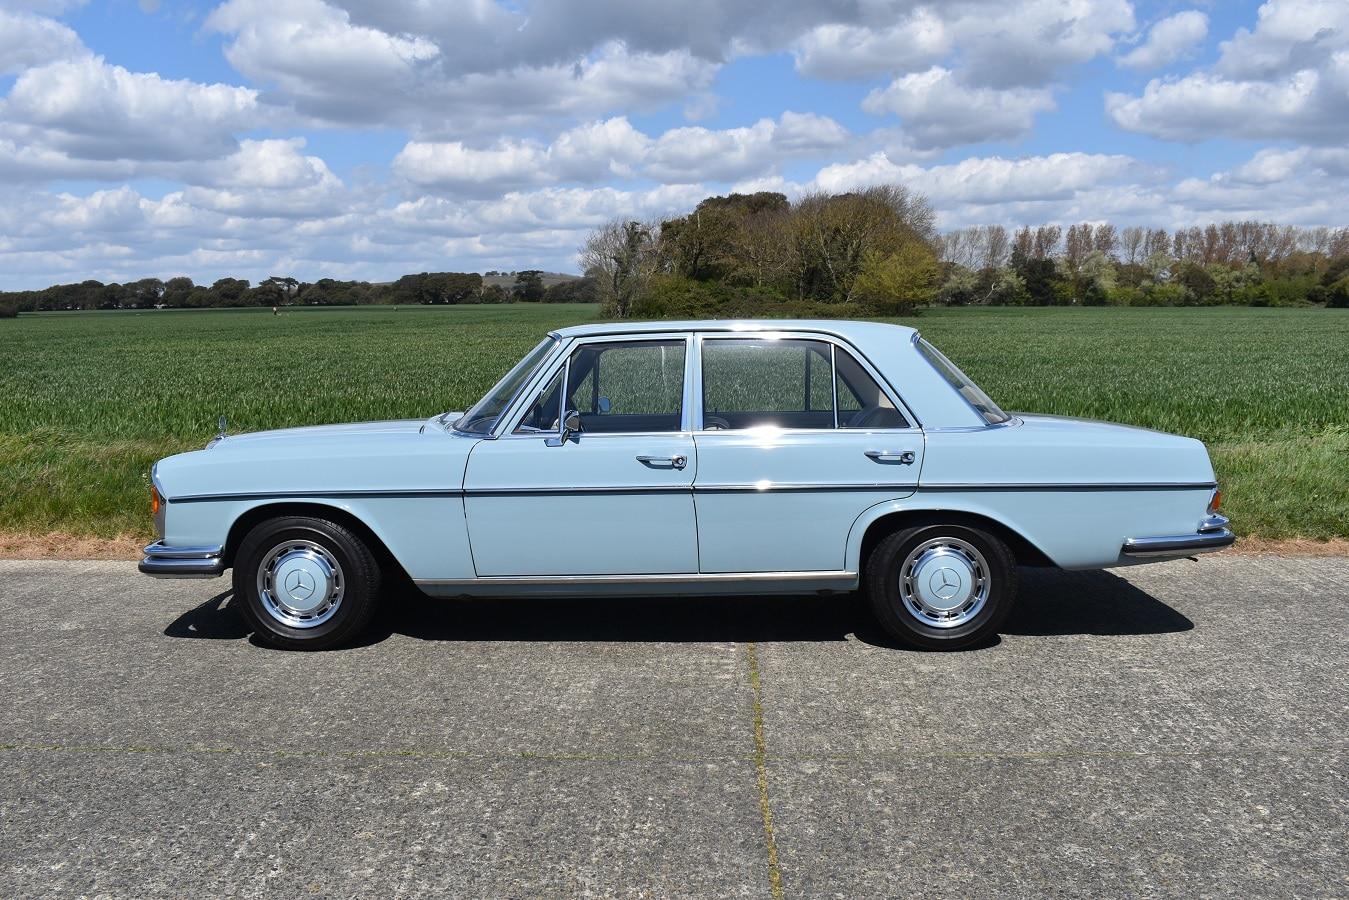 1971 Mercedes-Benz 280SE/8 in Horizon Blue